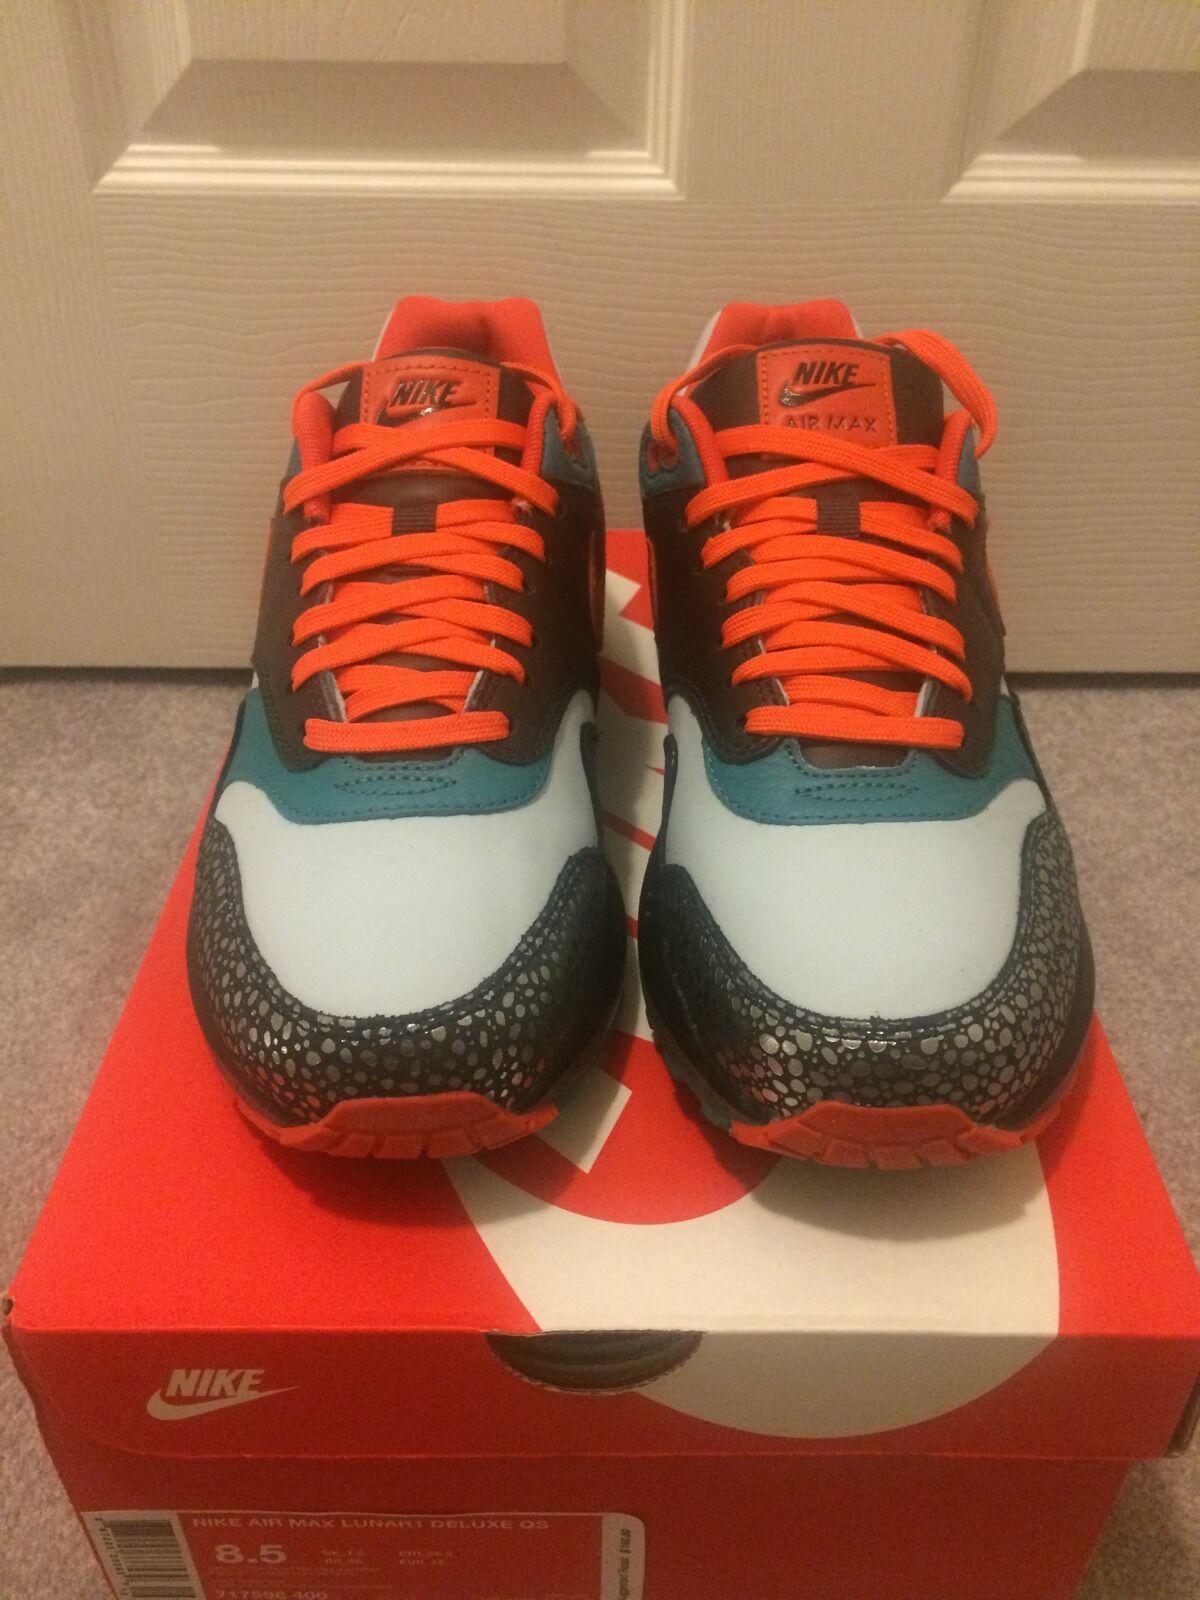 Nike air max lunar 1 super limitata deluxe qs kabutomushi dimensioni